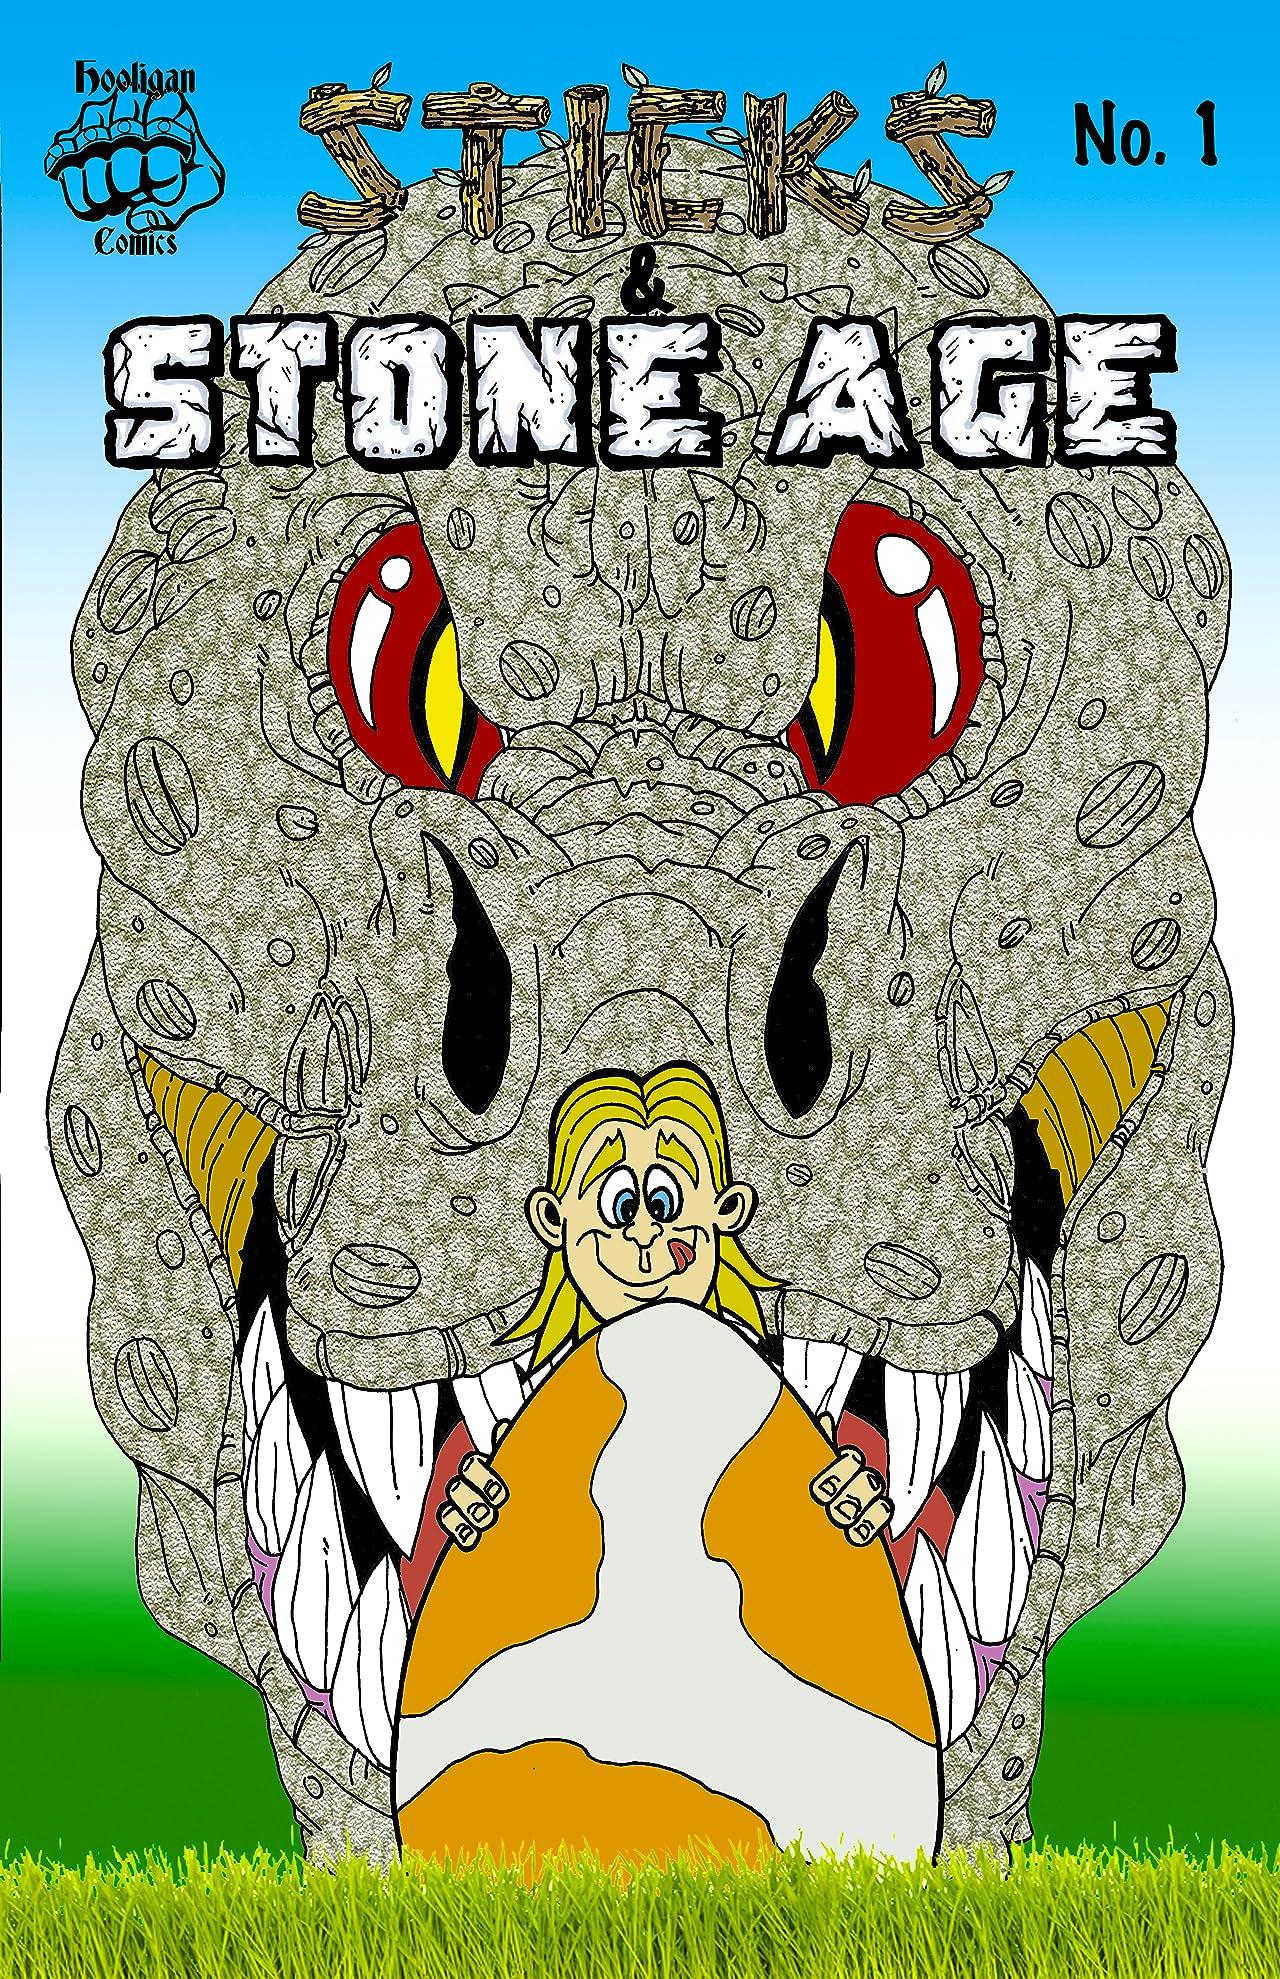 Sticks & Stone Age #1